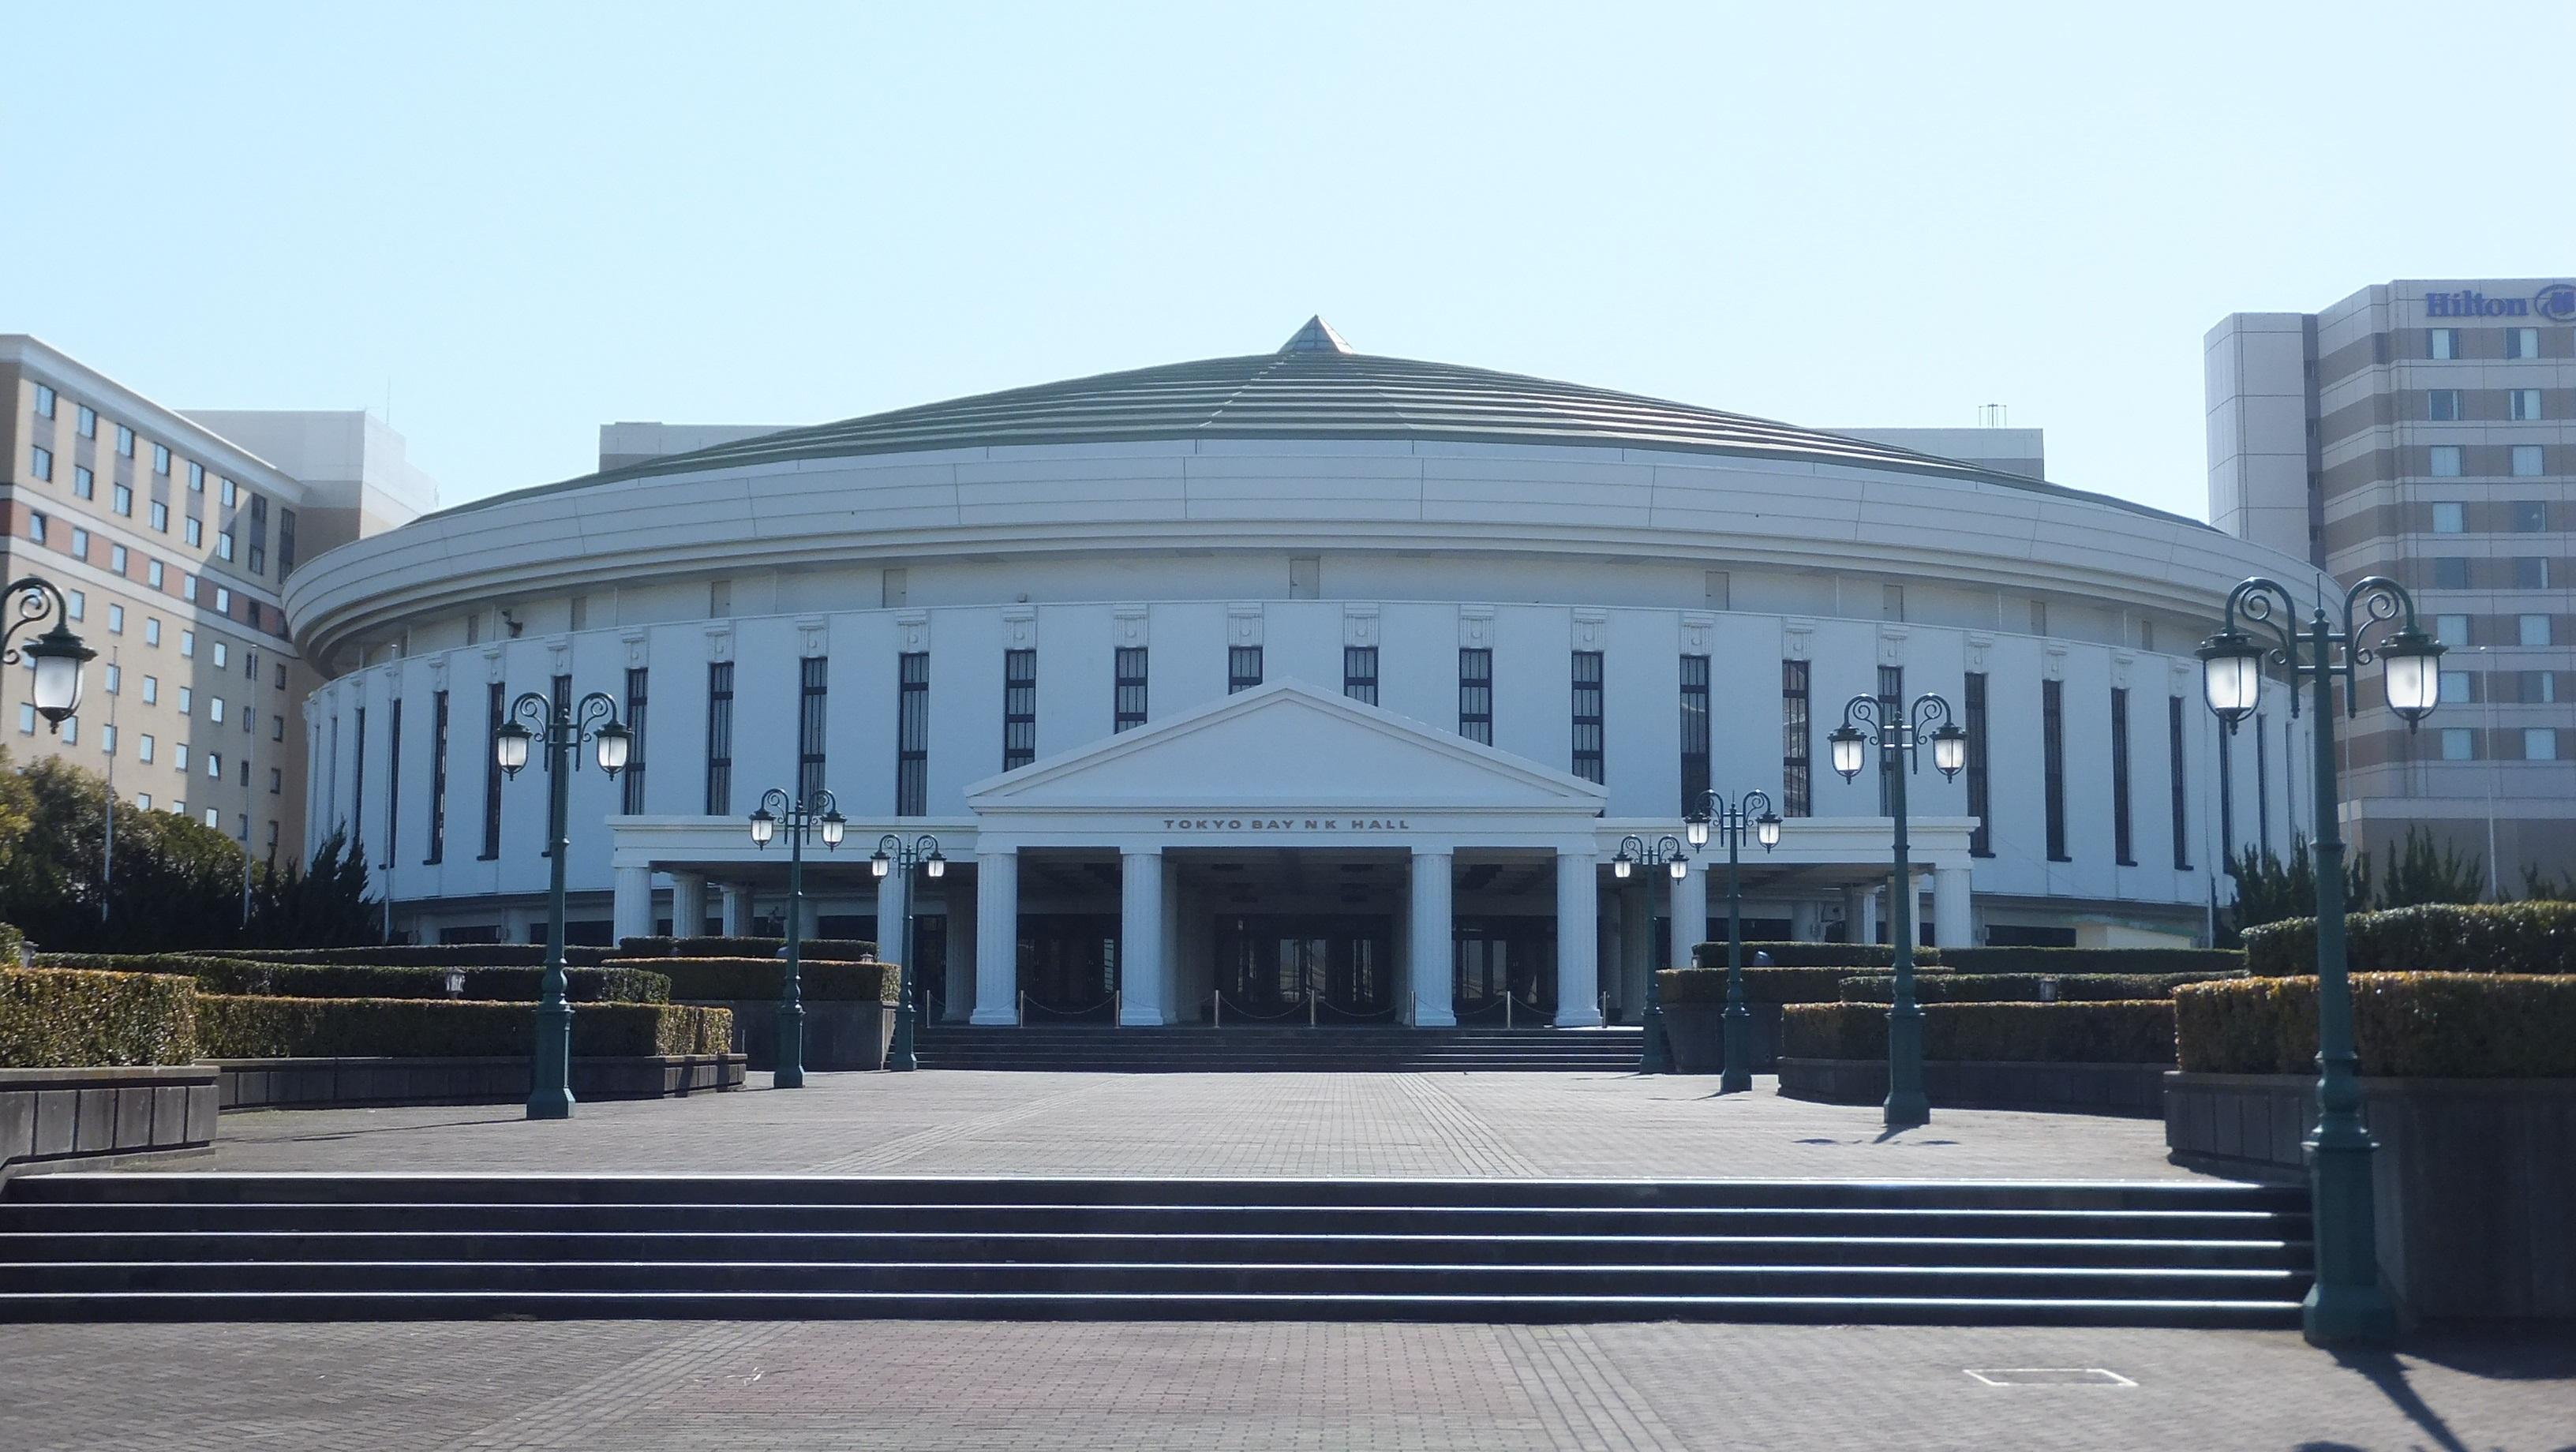 a] Tokyo Bay NK Hall 東京ベイNKホール - anoword : Search - Video ...